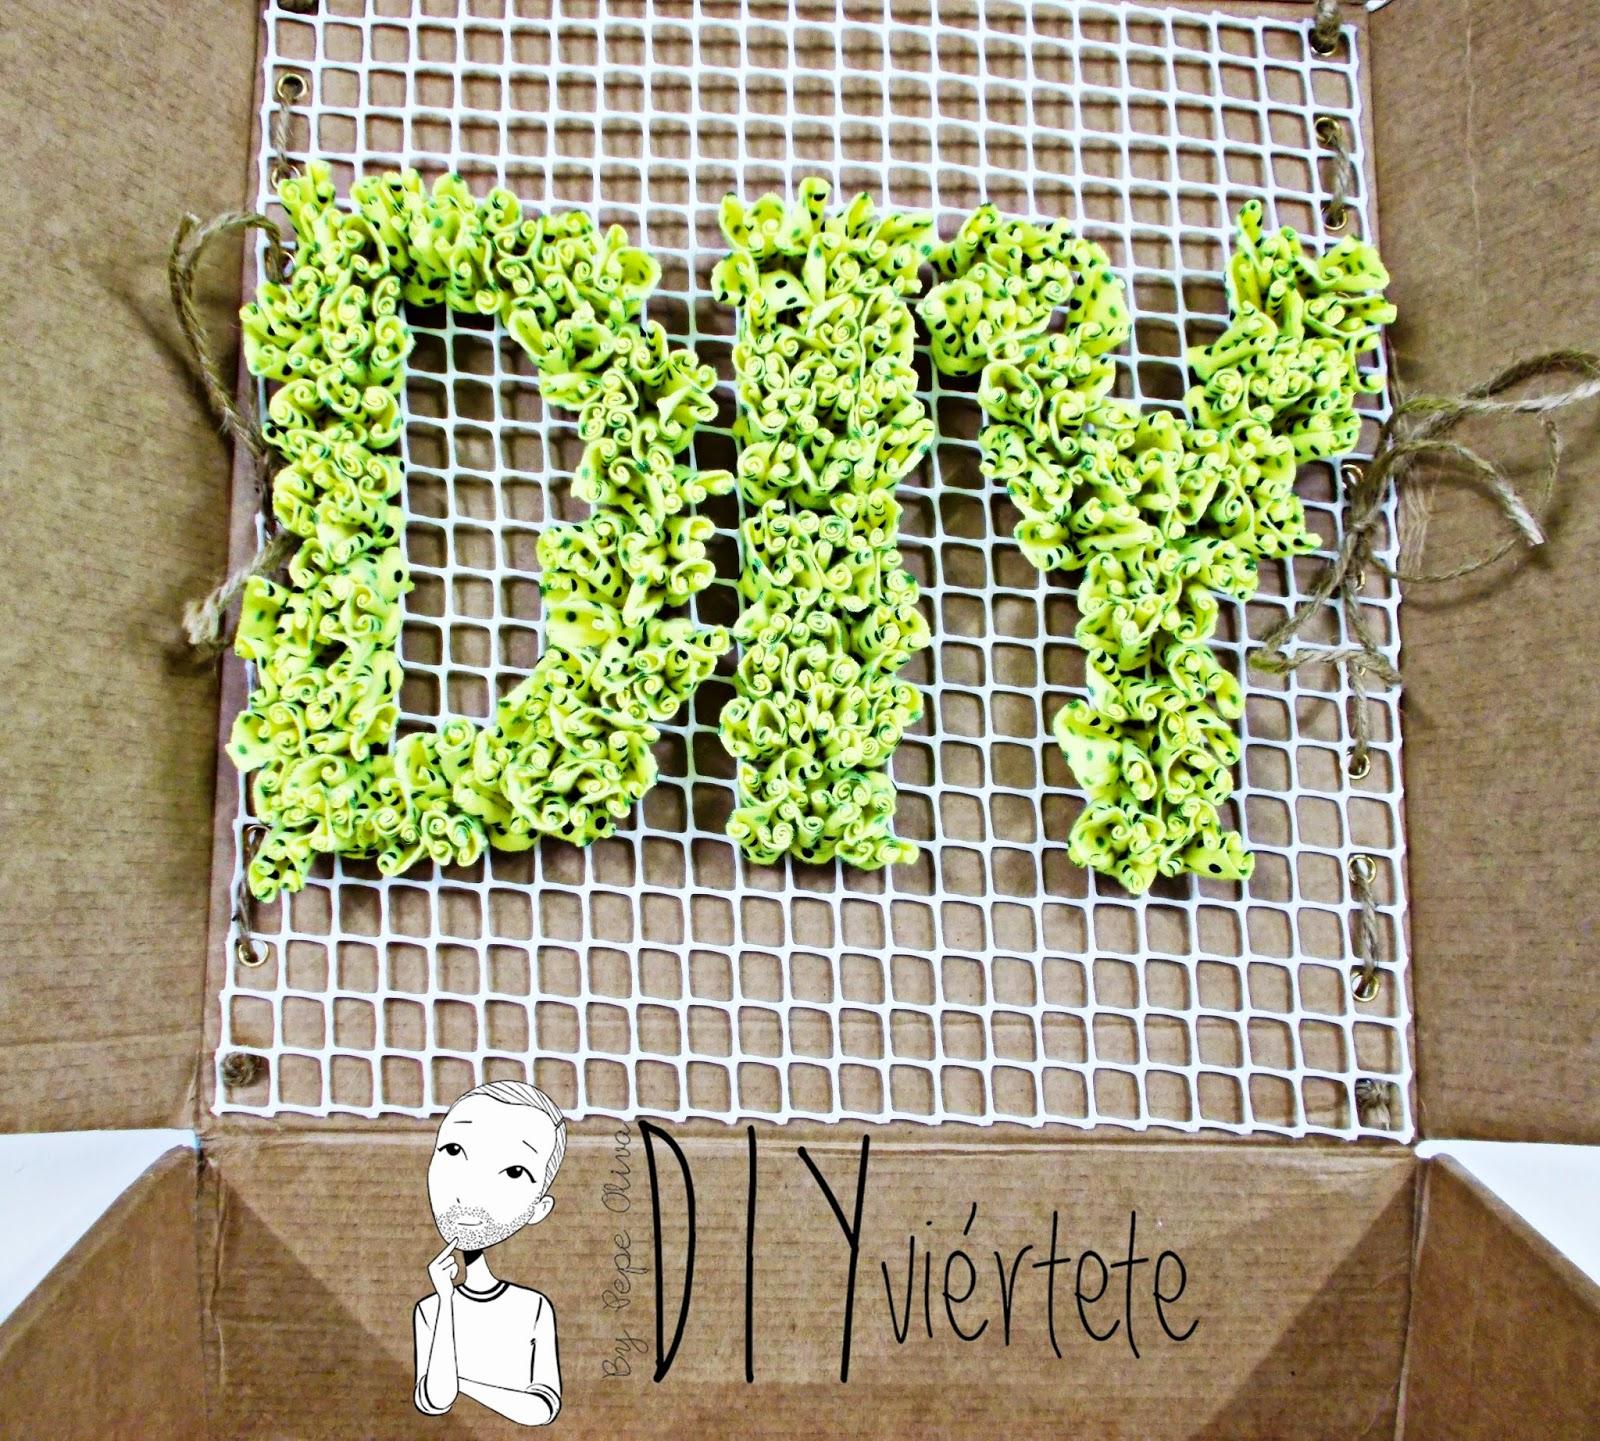 DIY-Do It Yourself-caja-cartón-selfpackaging-customizar-handbox-yodona-diyhuntersday-craftlovers-8